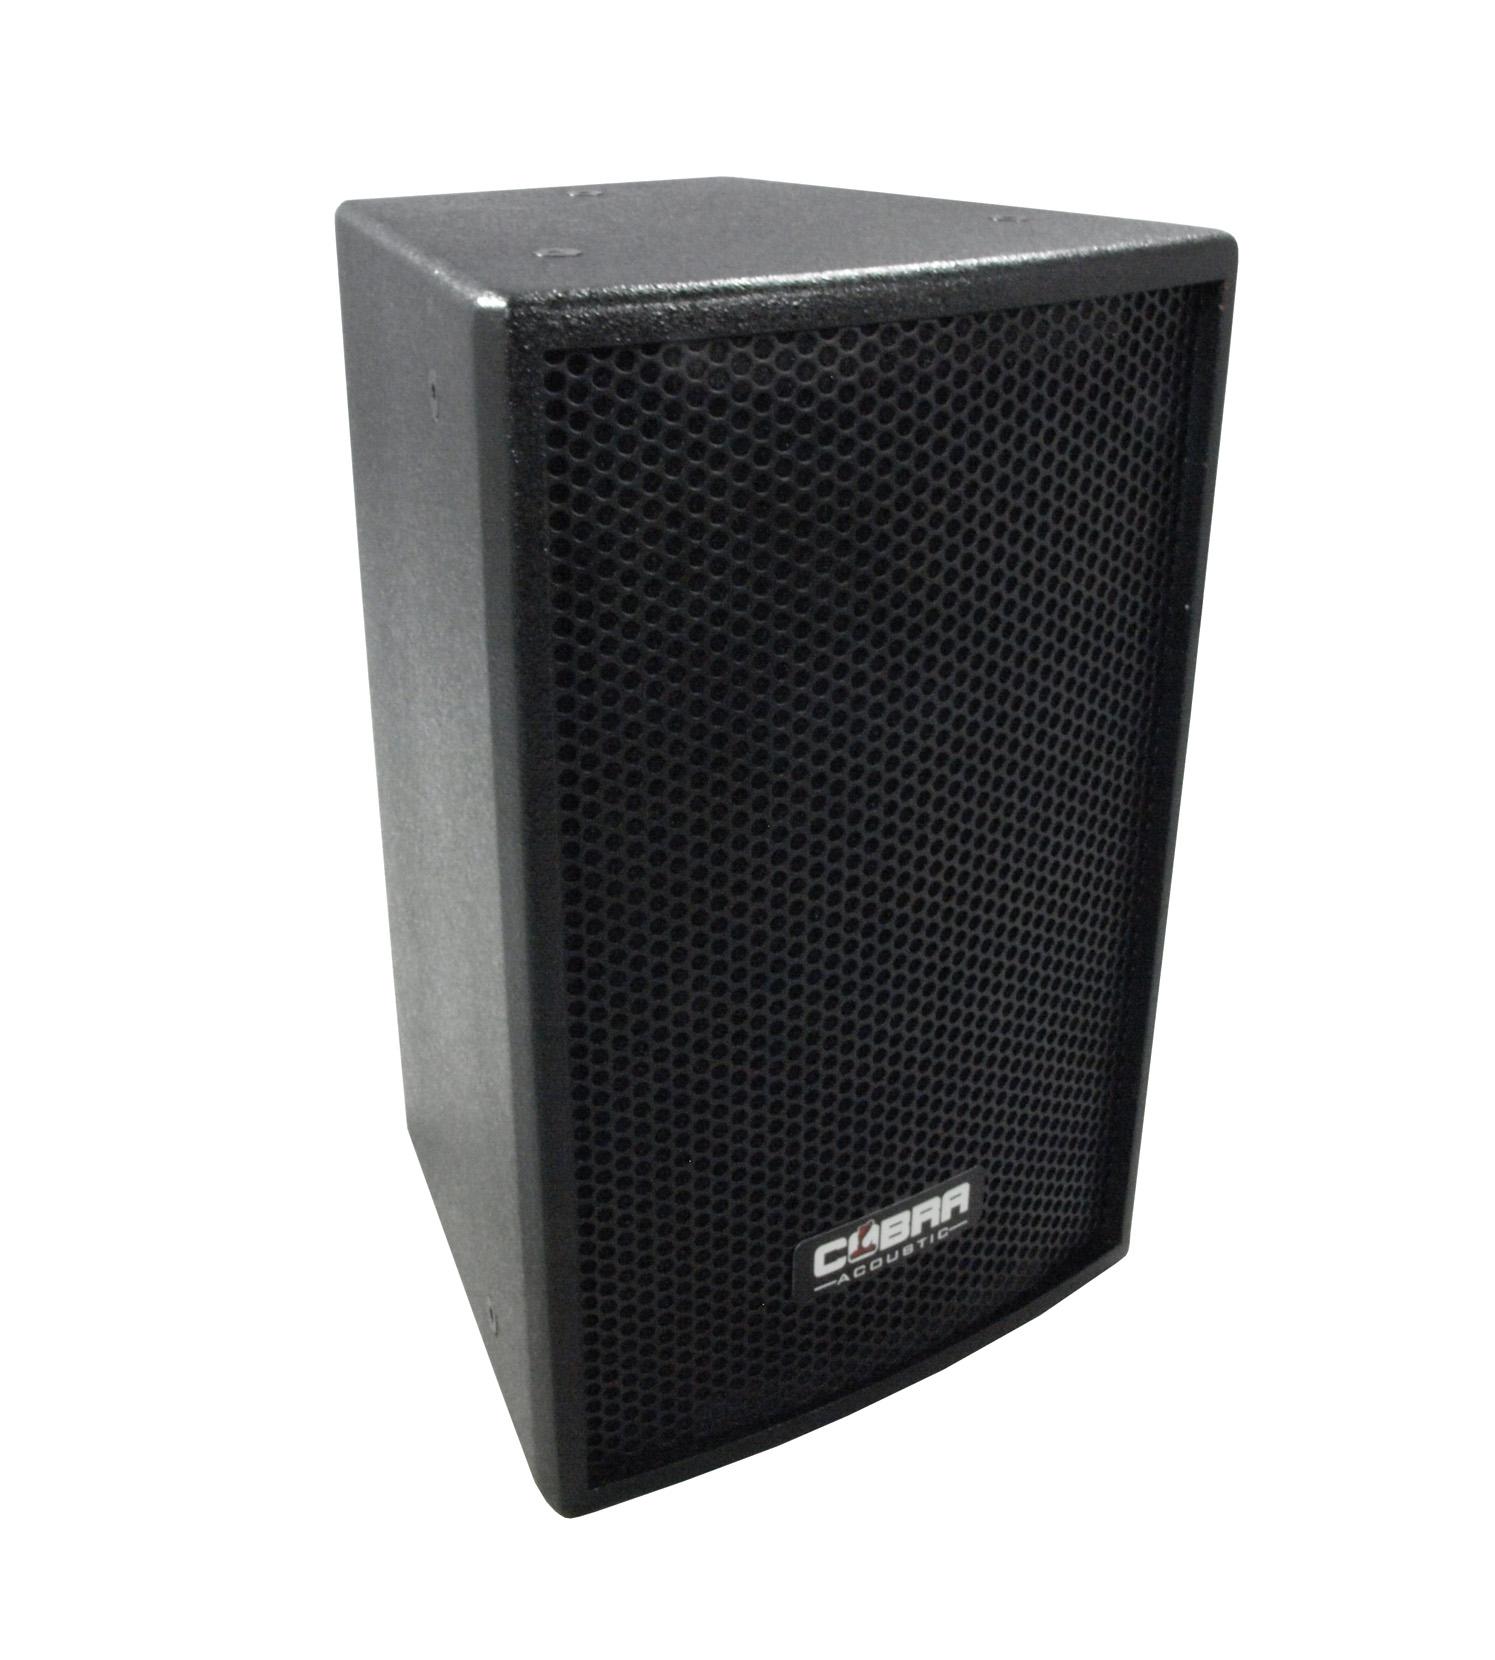 "Cobra Acoustic Speaker CFR08 8"" 100w"